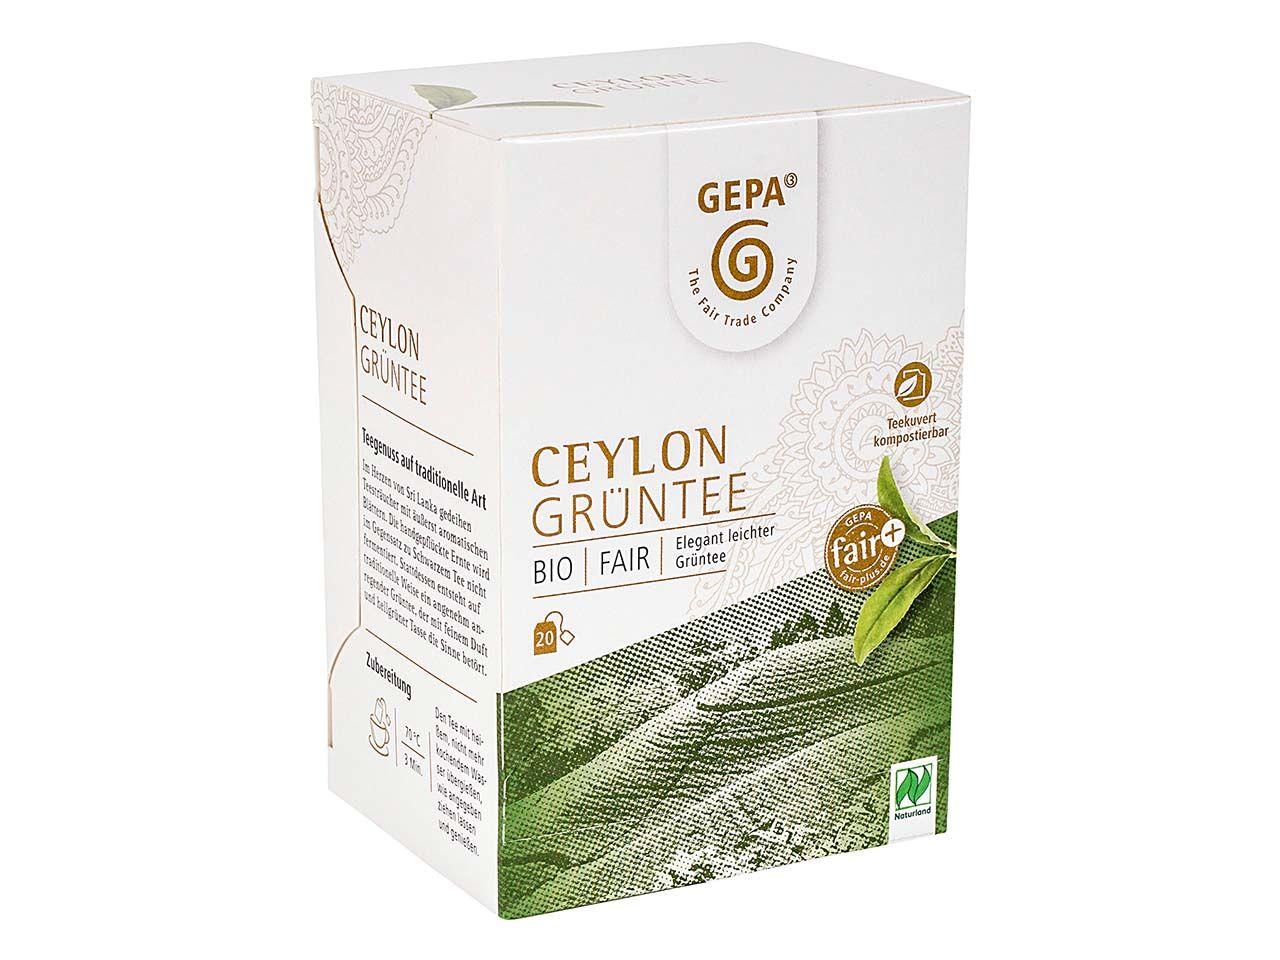 GEPA Grüner Bio-Tee Ceylon , 20 x 2 g 8880947